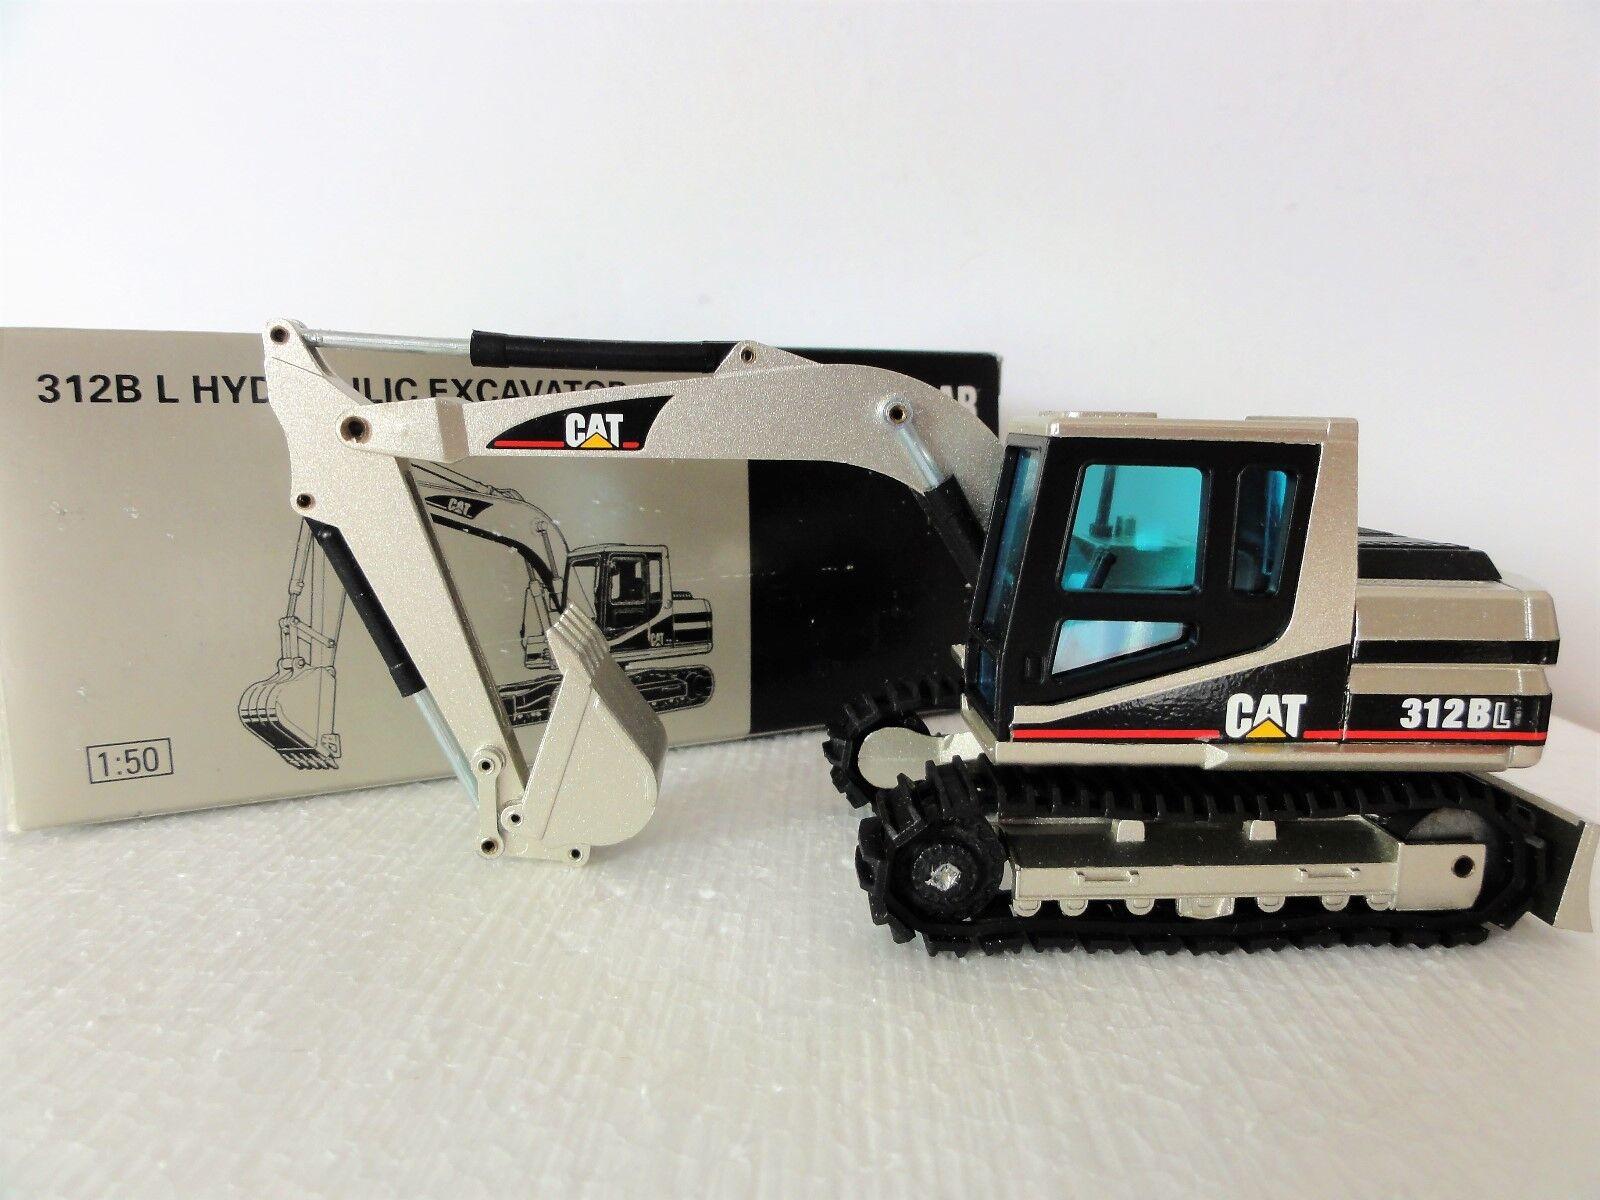 NZG 414-03 -Caterpillar 312B L EXCAVATOR PALE oro -1 50  NEW IN BOX  RARE